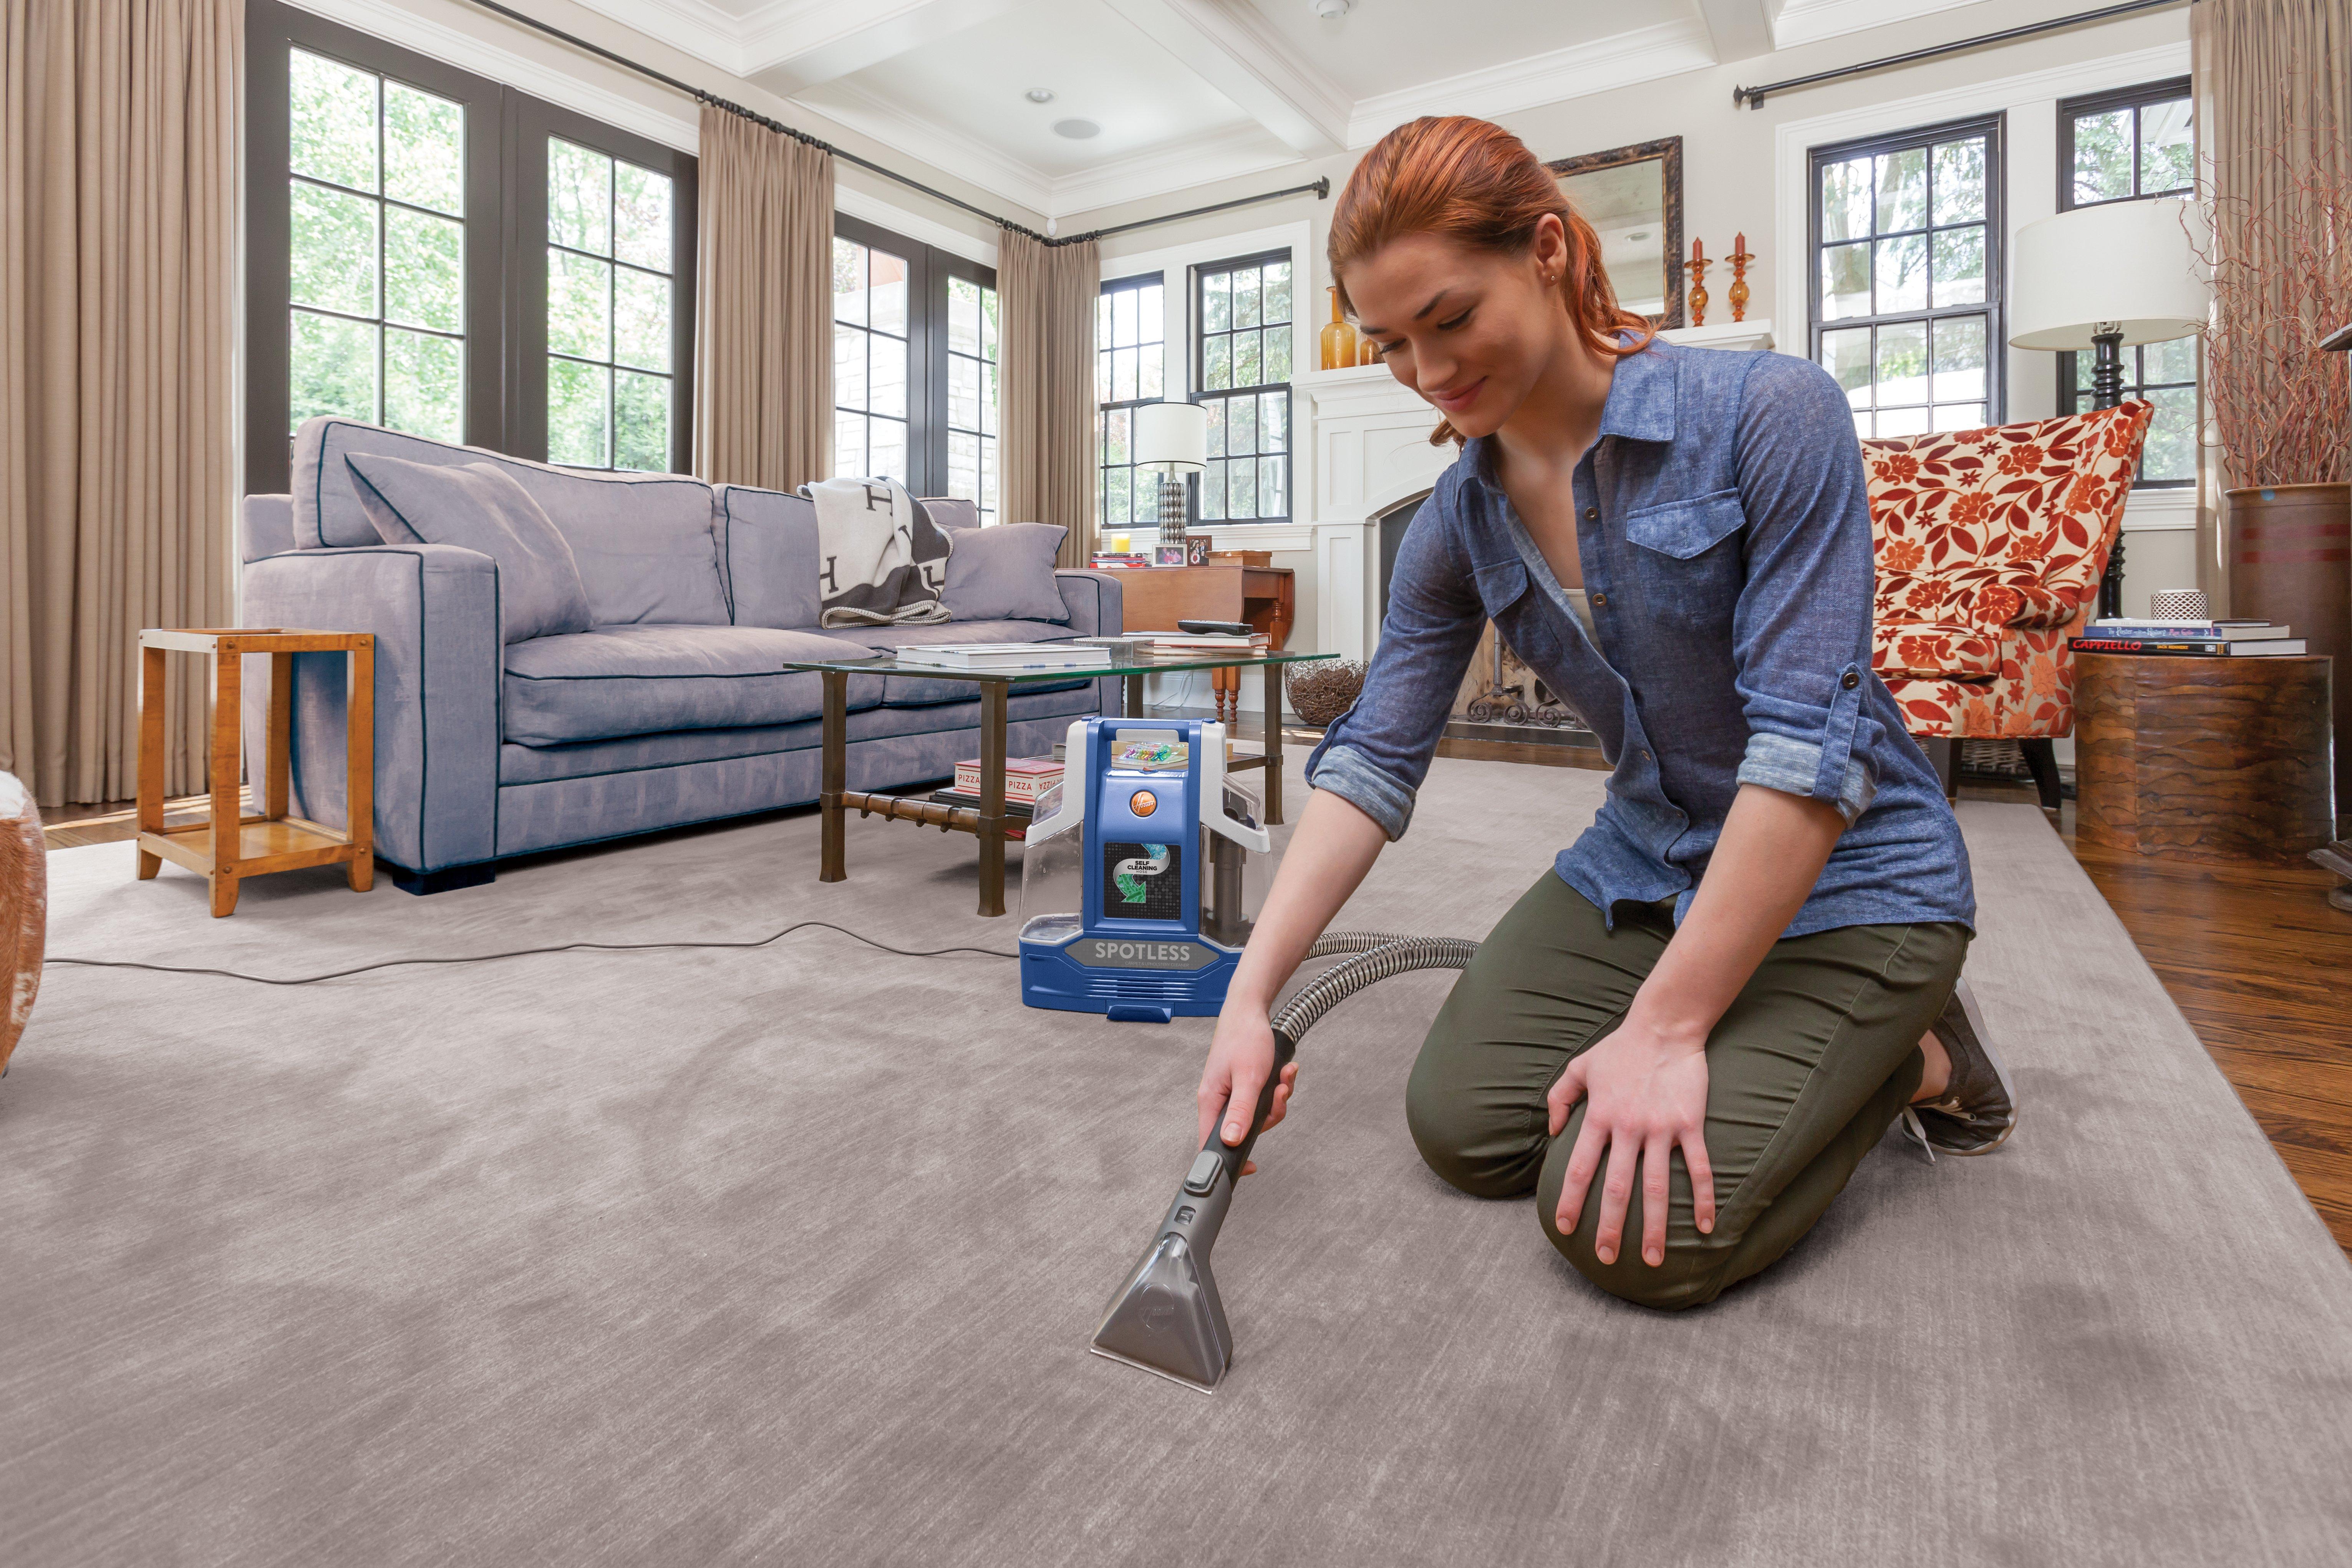 Spotless Portable Carpet & Upholstery Cleaner2